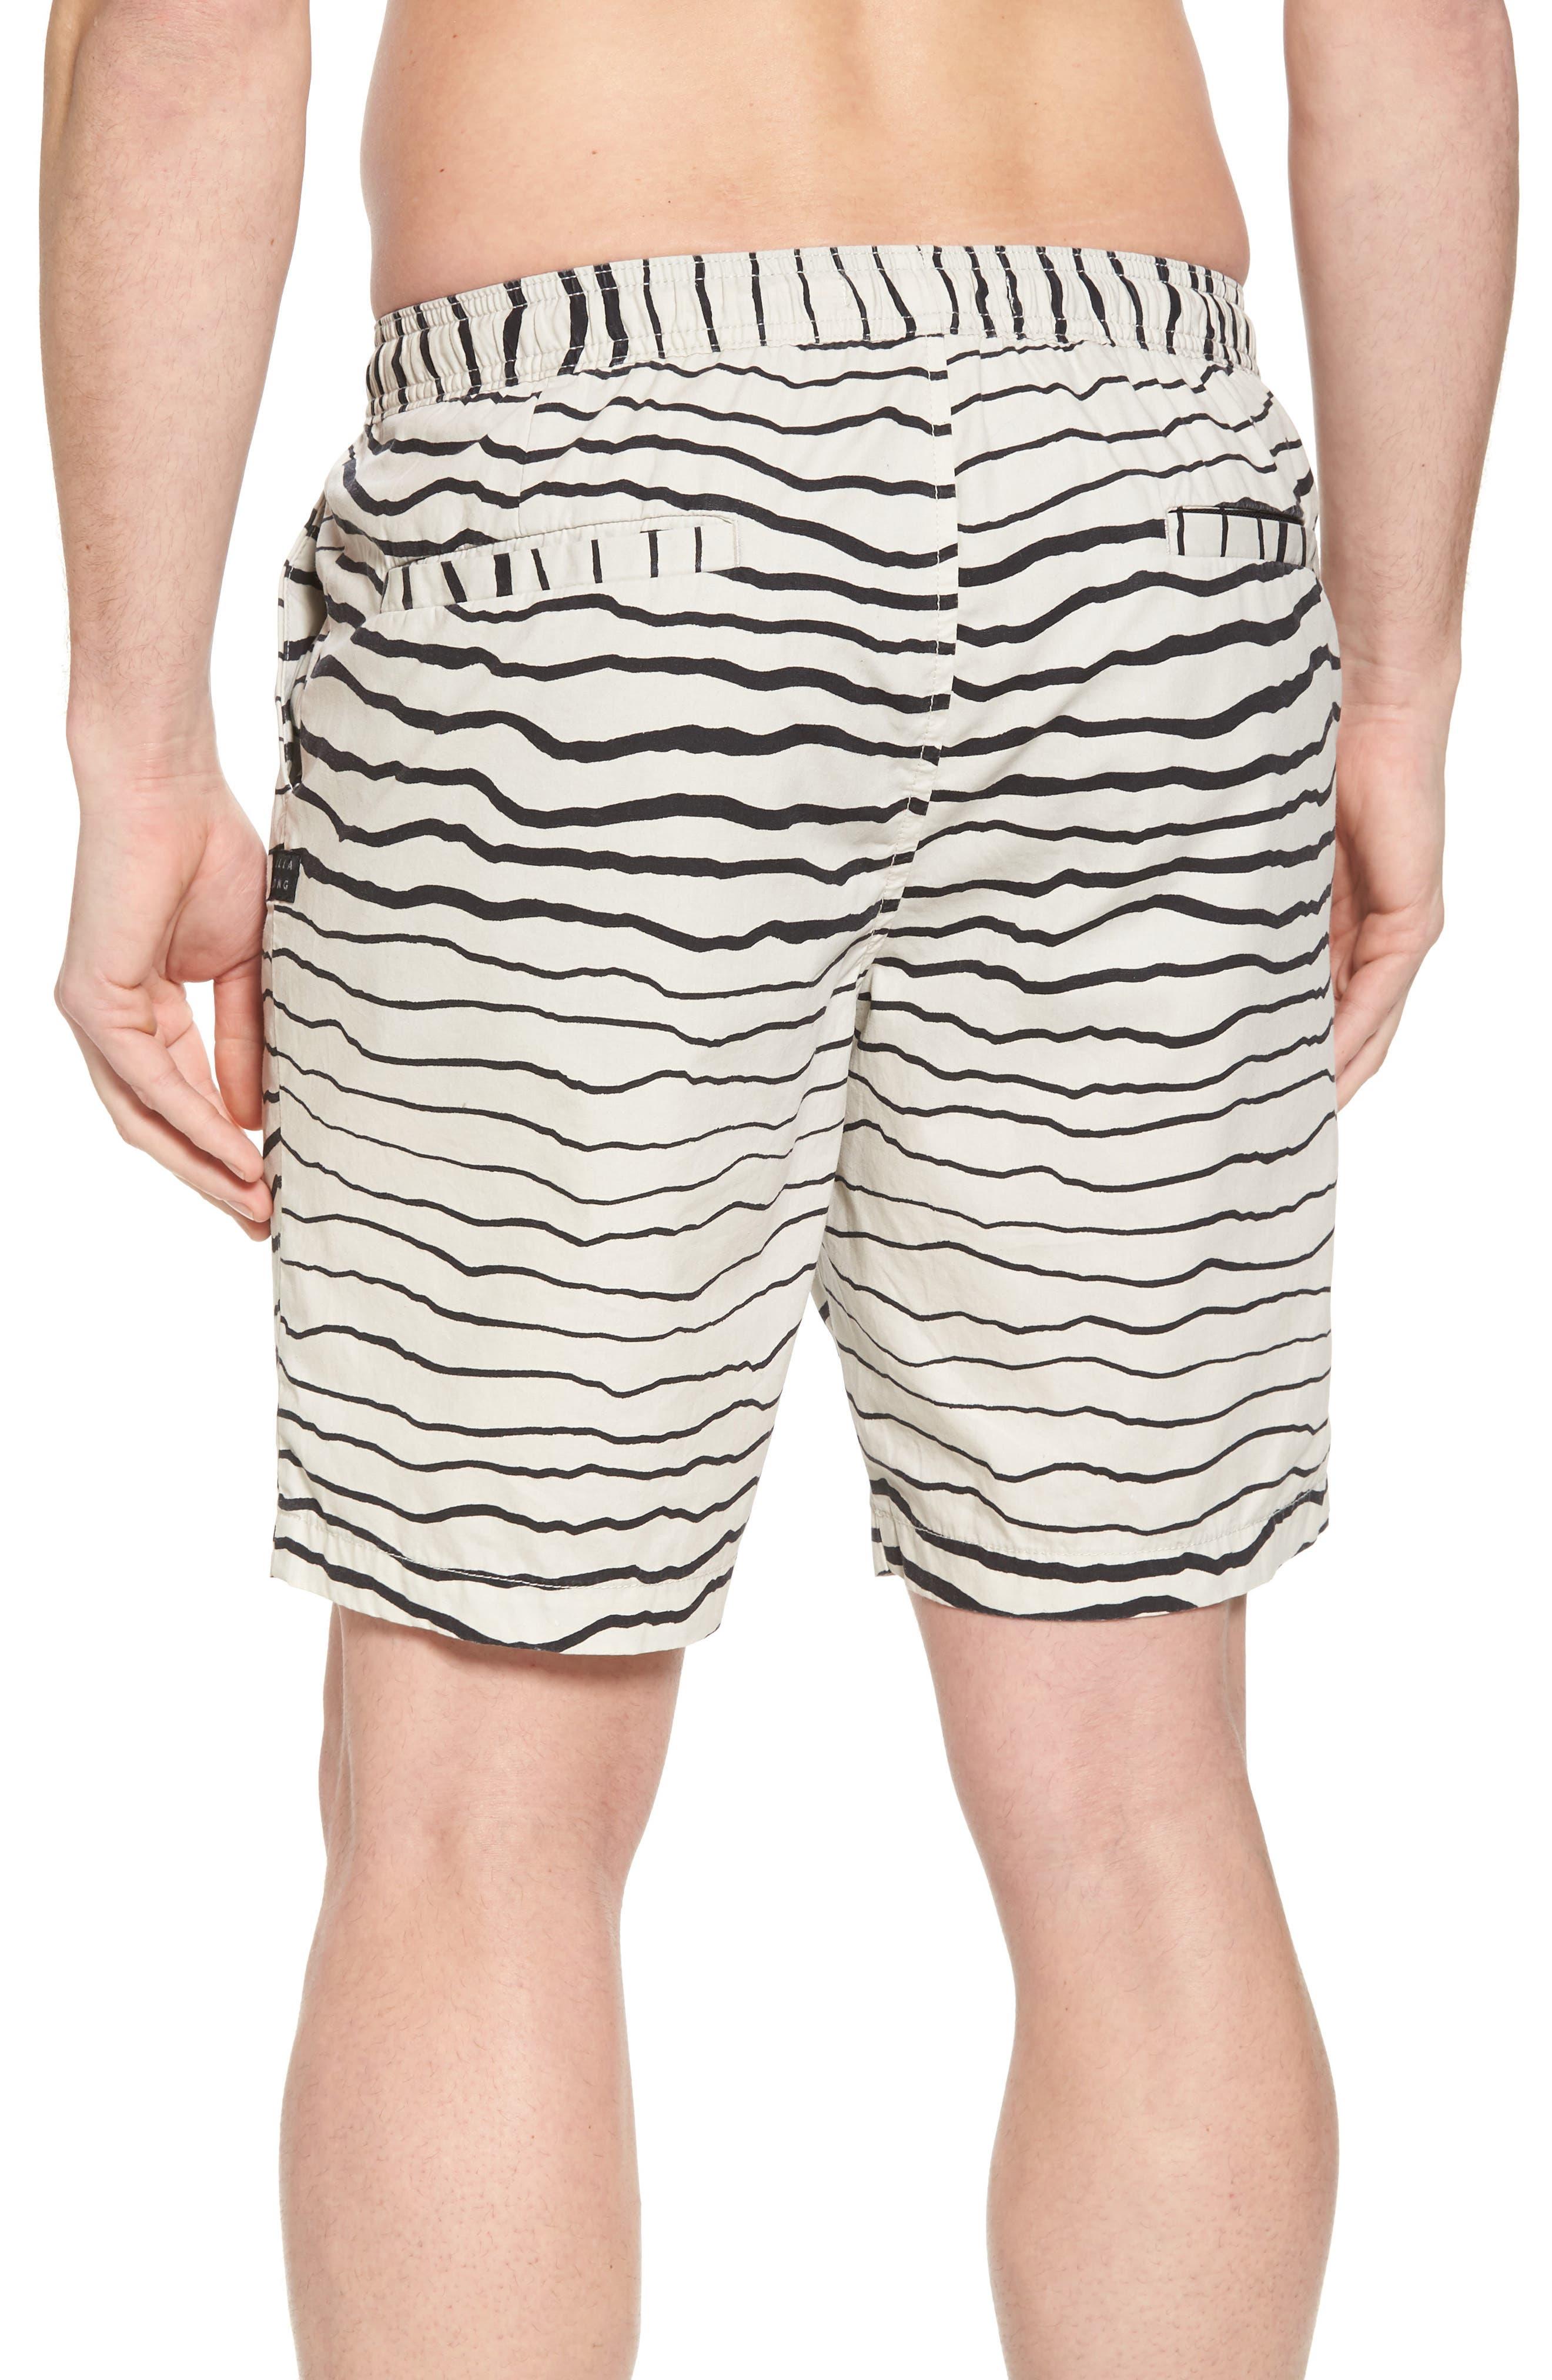 Larry Layback Sunday Shorts,                             Alternate thumbnail 4, color,